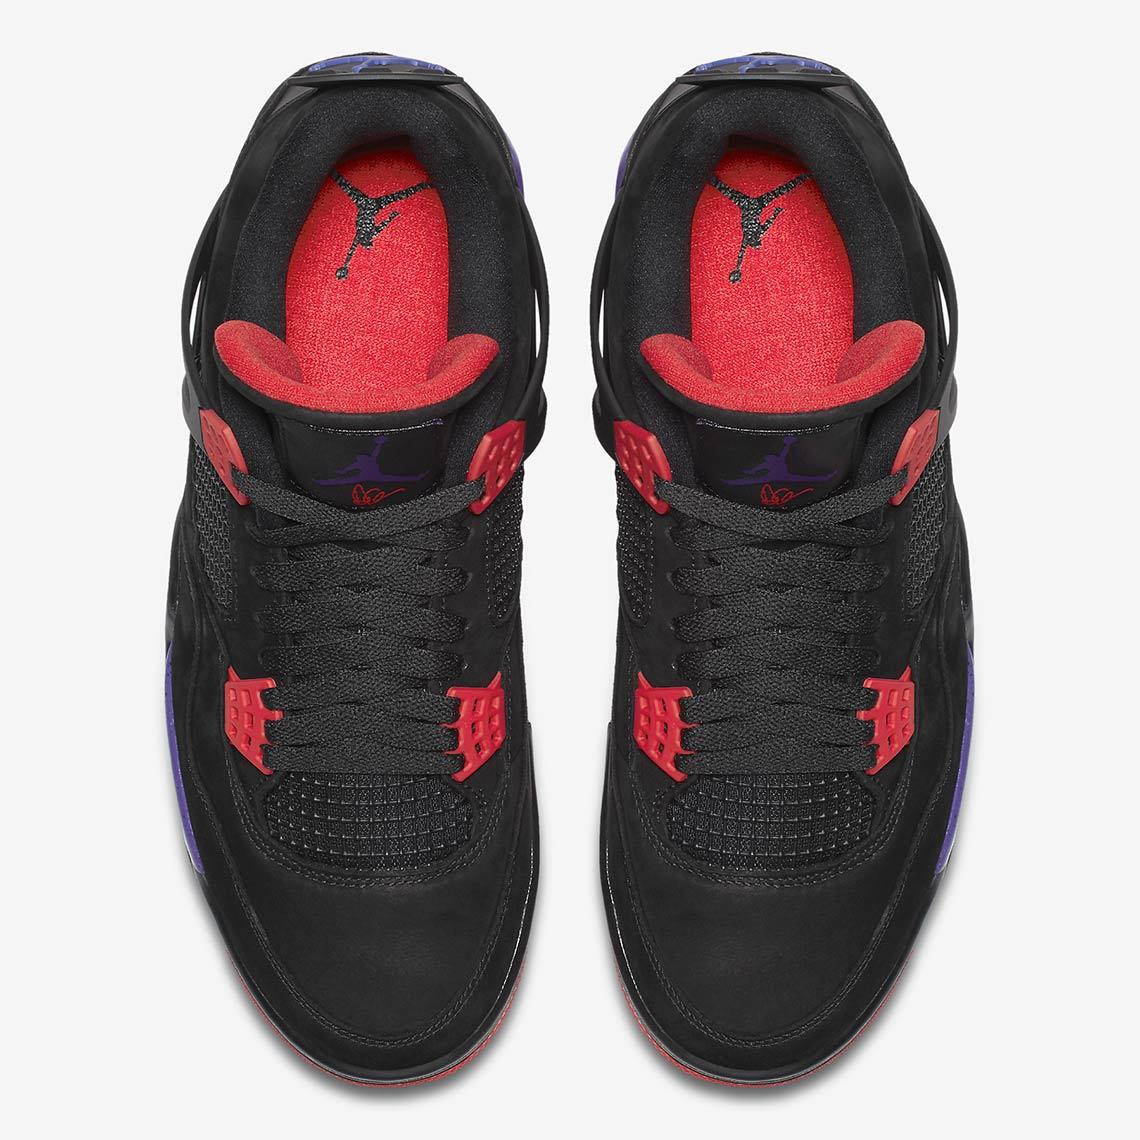 separation shoes 7db5a 4bb91 Air Jordan 4